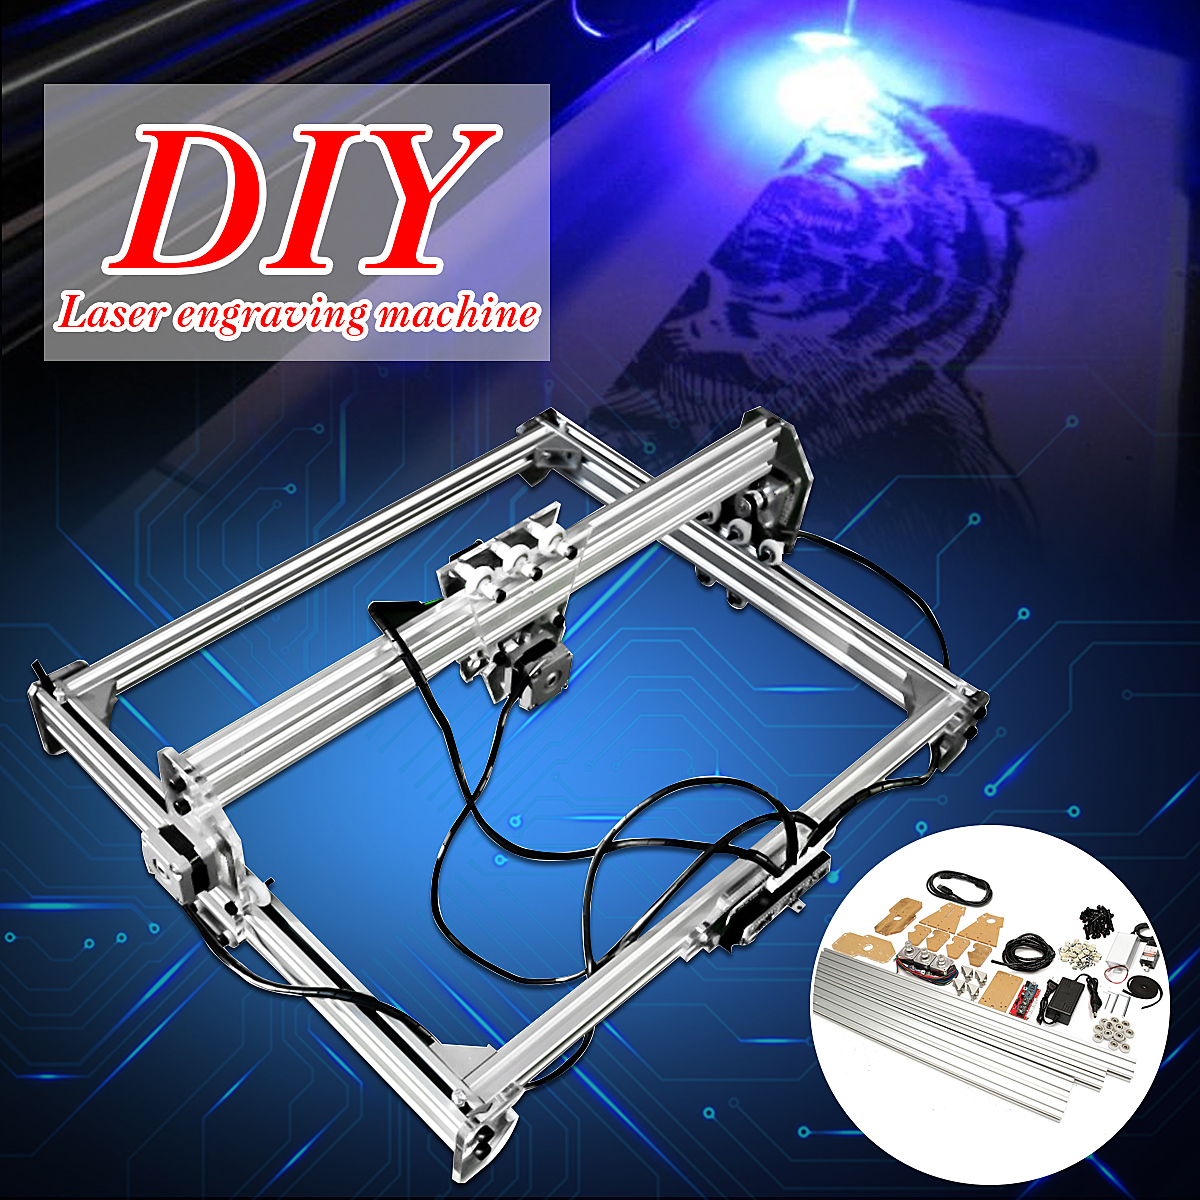 50*65 centímetros Mini 3000 MW Azul Do Laser CNC Máquina de Gravura Eixo DC 12 2 V DIY Gravador de Mesa router de madeira/Cortador/Impressora A Laser +